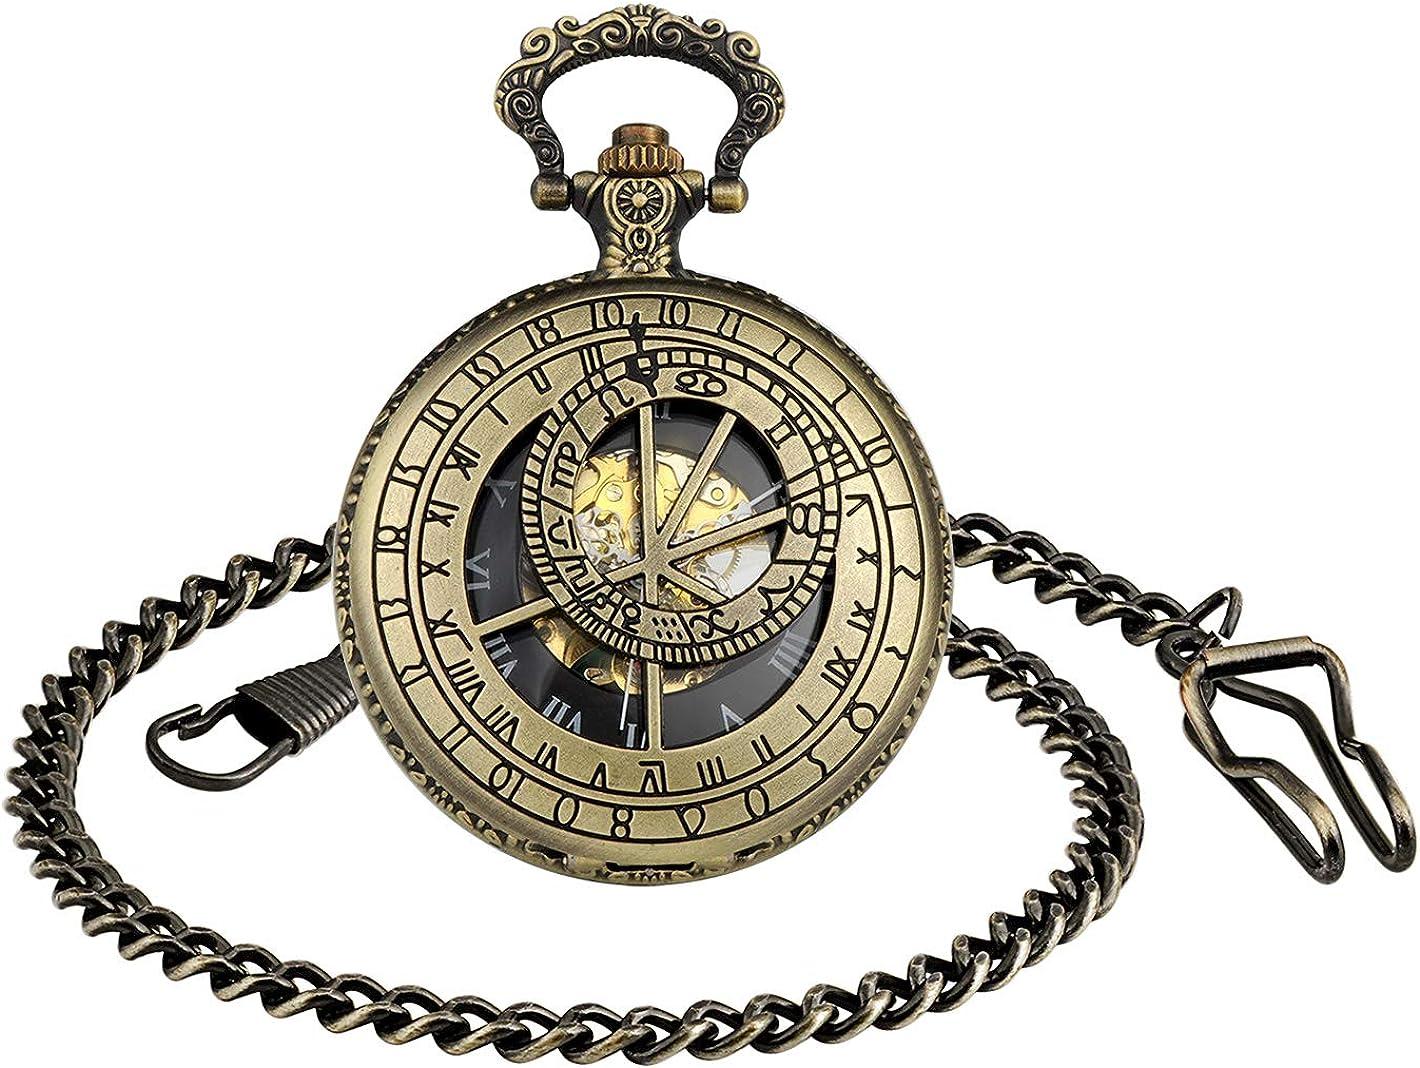 MICGIGI - Reloj de bolsillo para hombre con cadena, analógico, cuerda manual, 12 constelación, relojes de bolsillo mecánicos de bronce